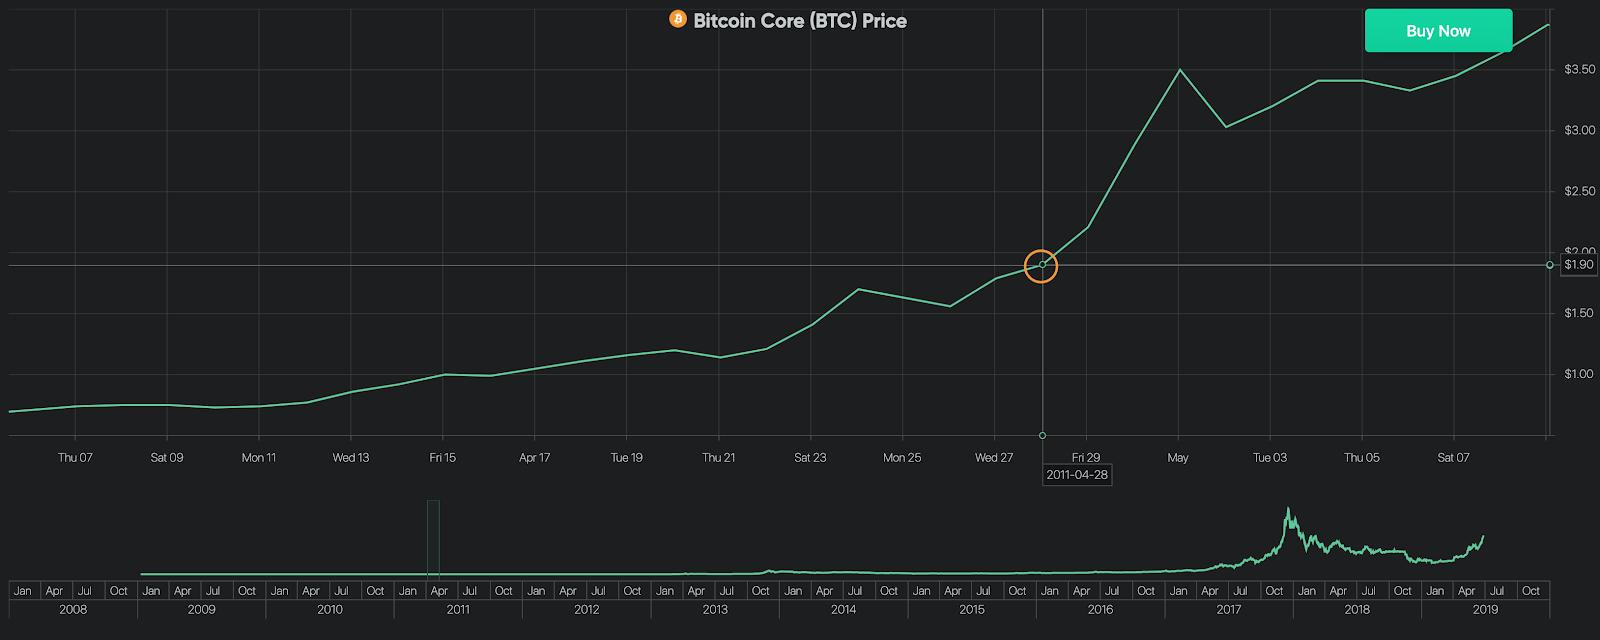 Bitcoin Price on April 28, 2011